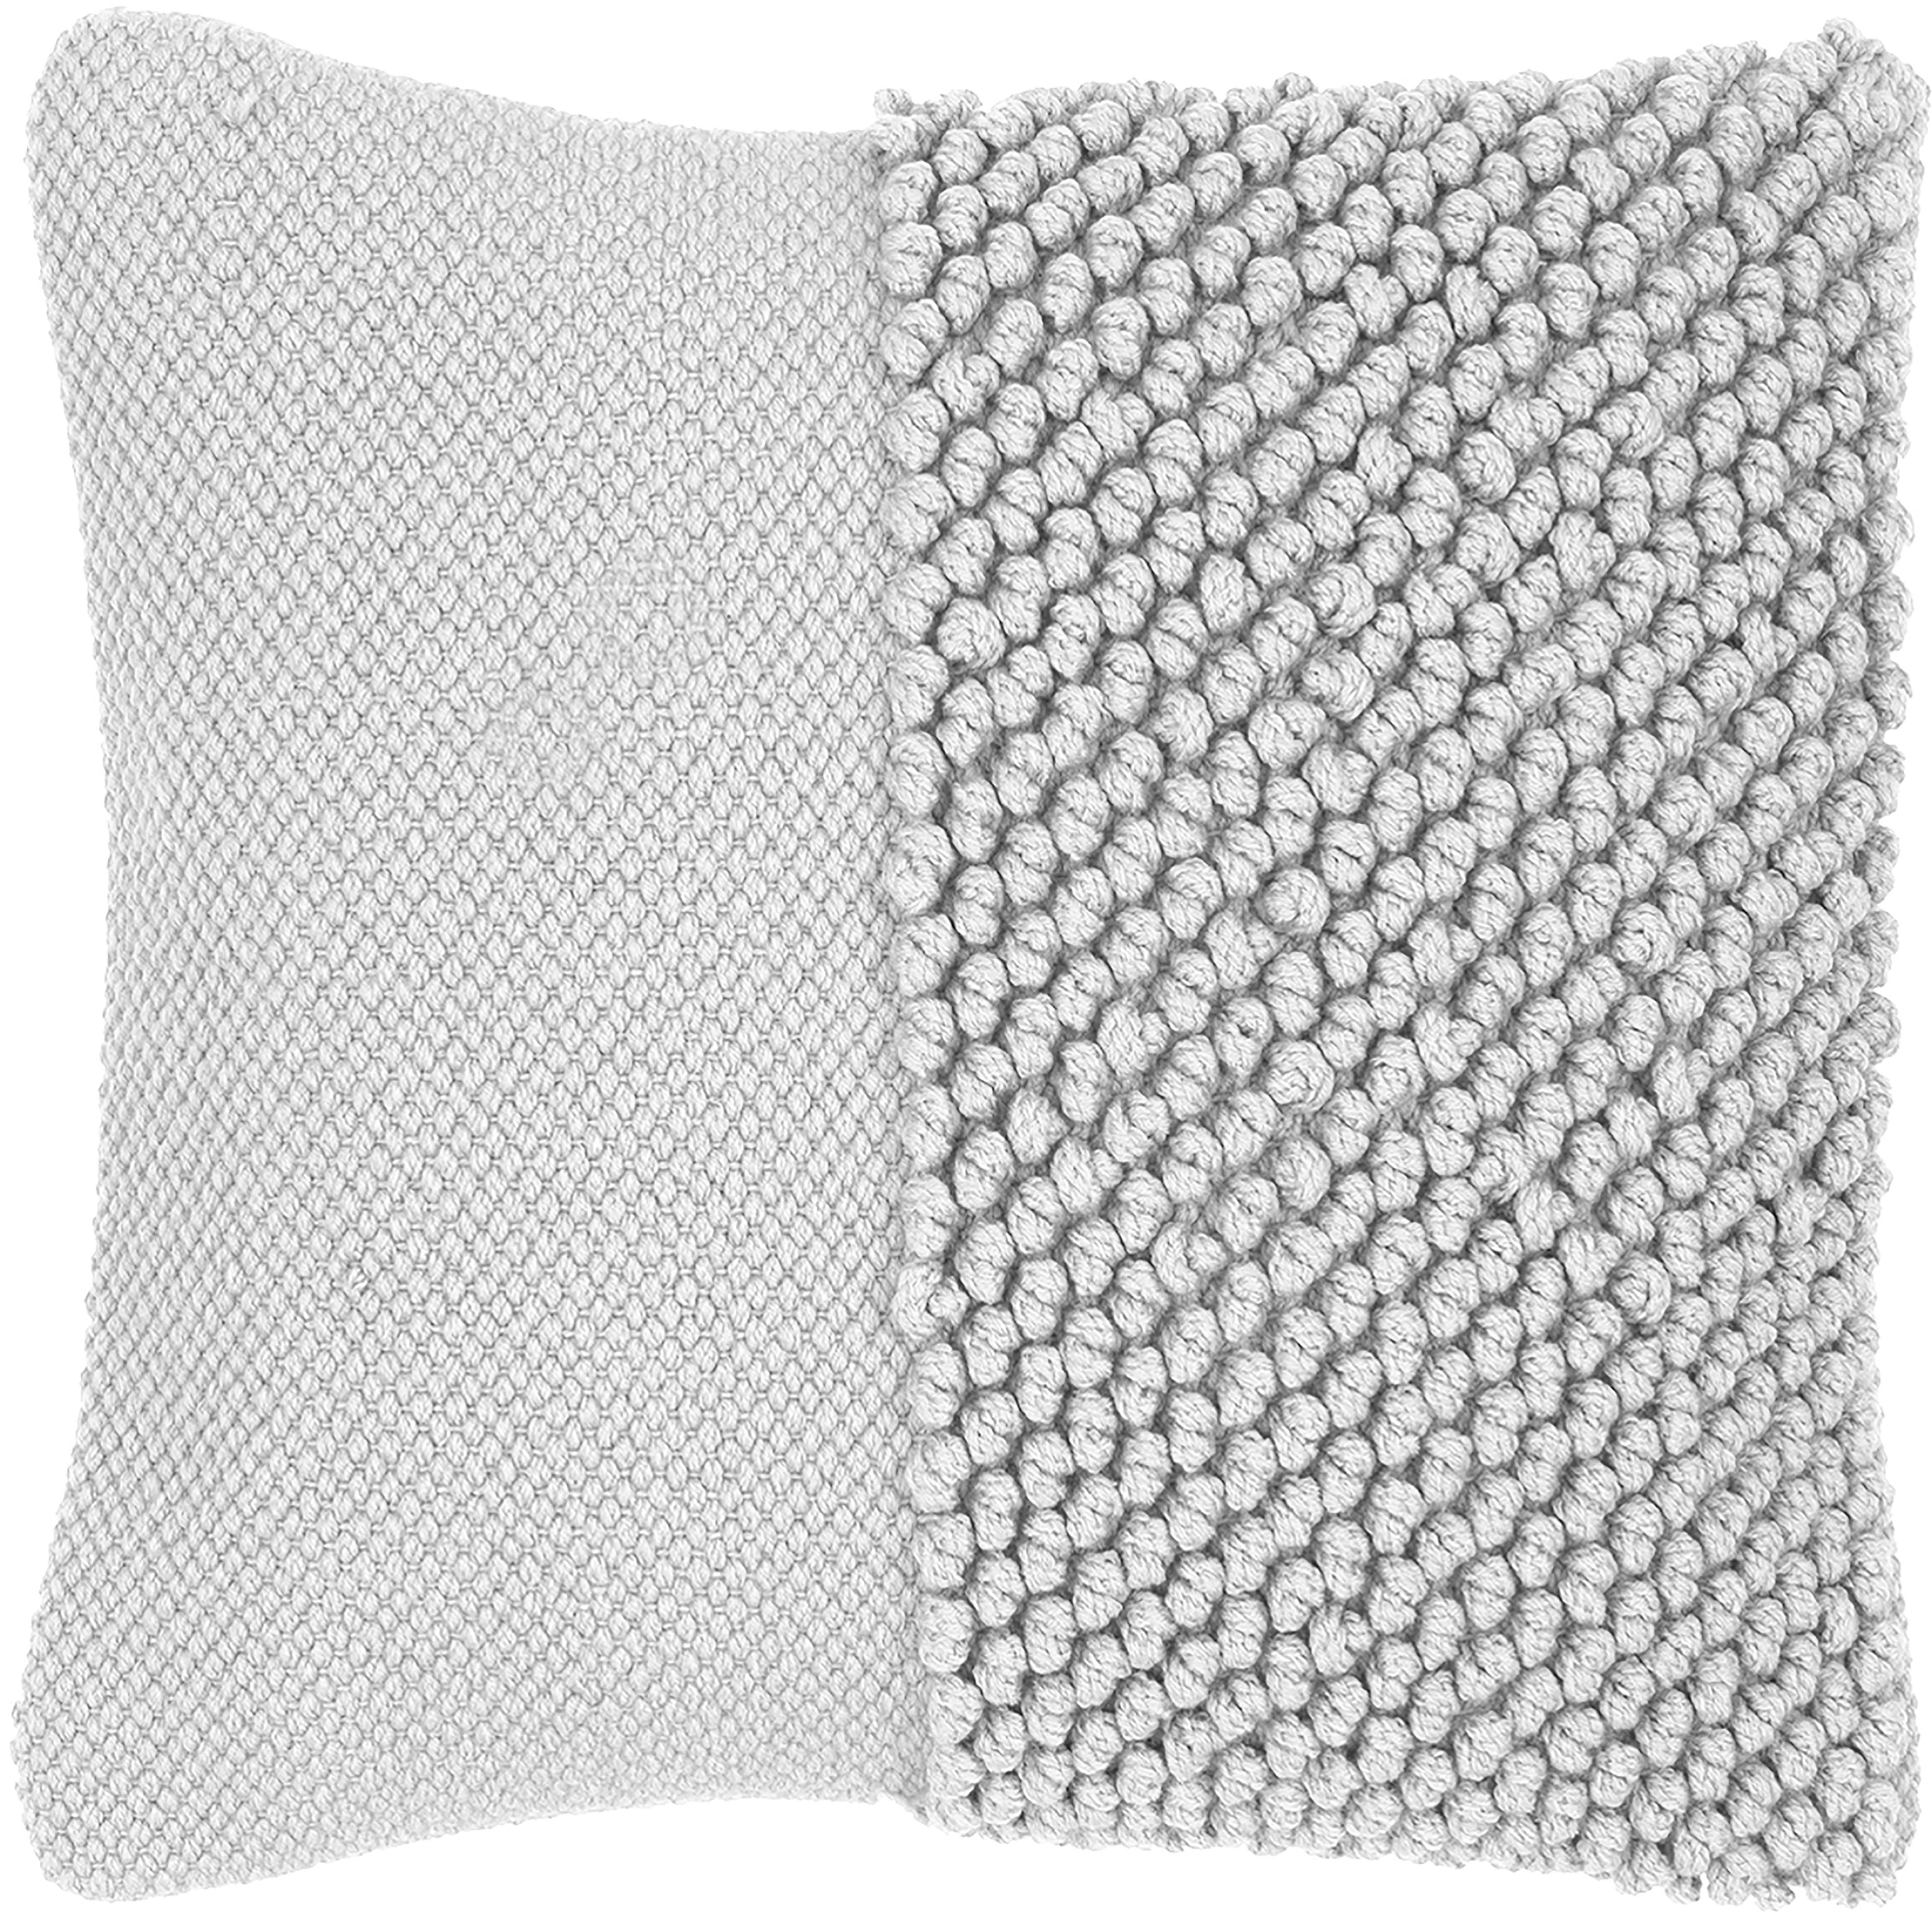 Funda de cojín Andi, 90%acrílico, 10%algodón, Gris claro, An 40 x L 40 cm